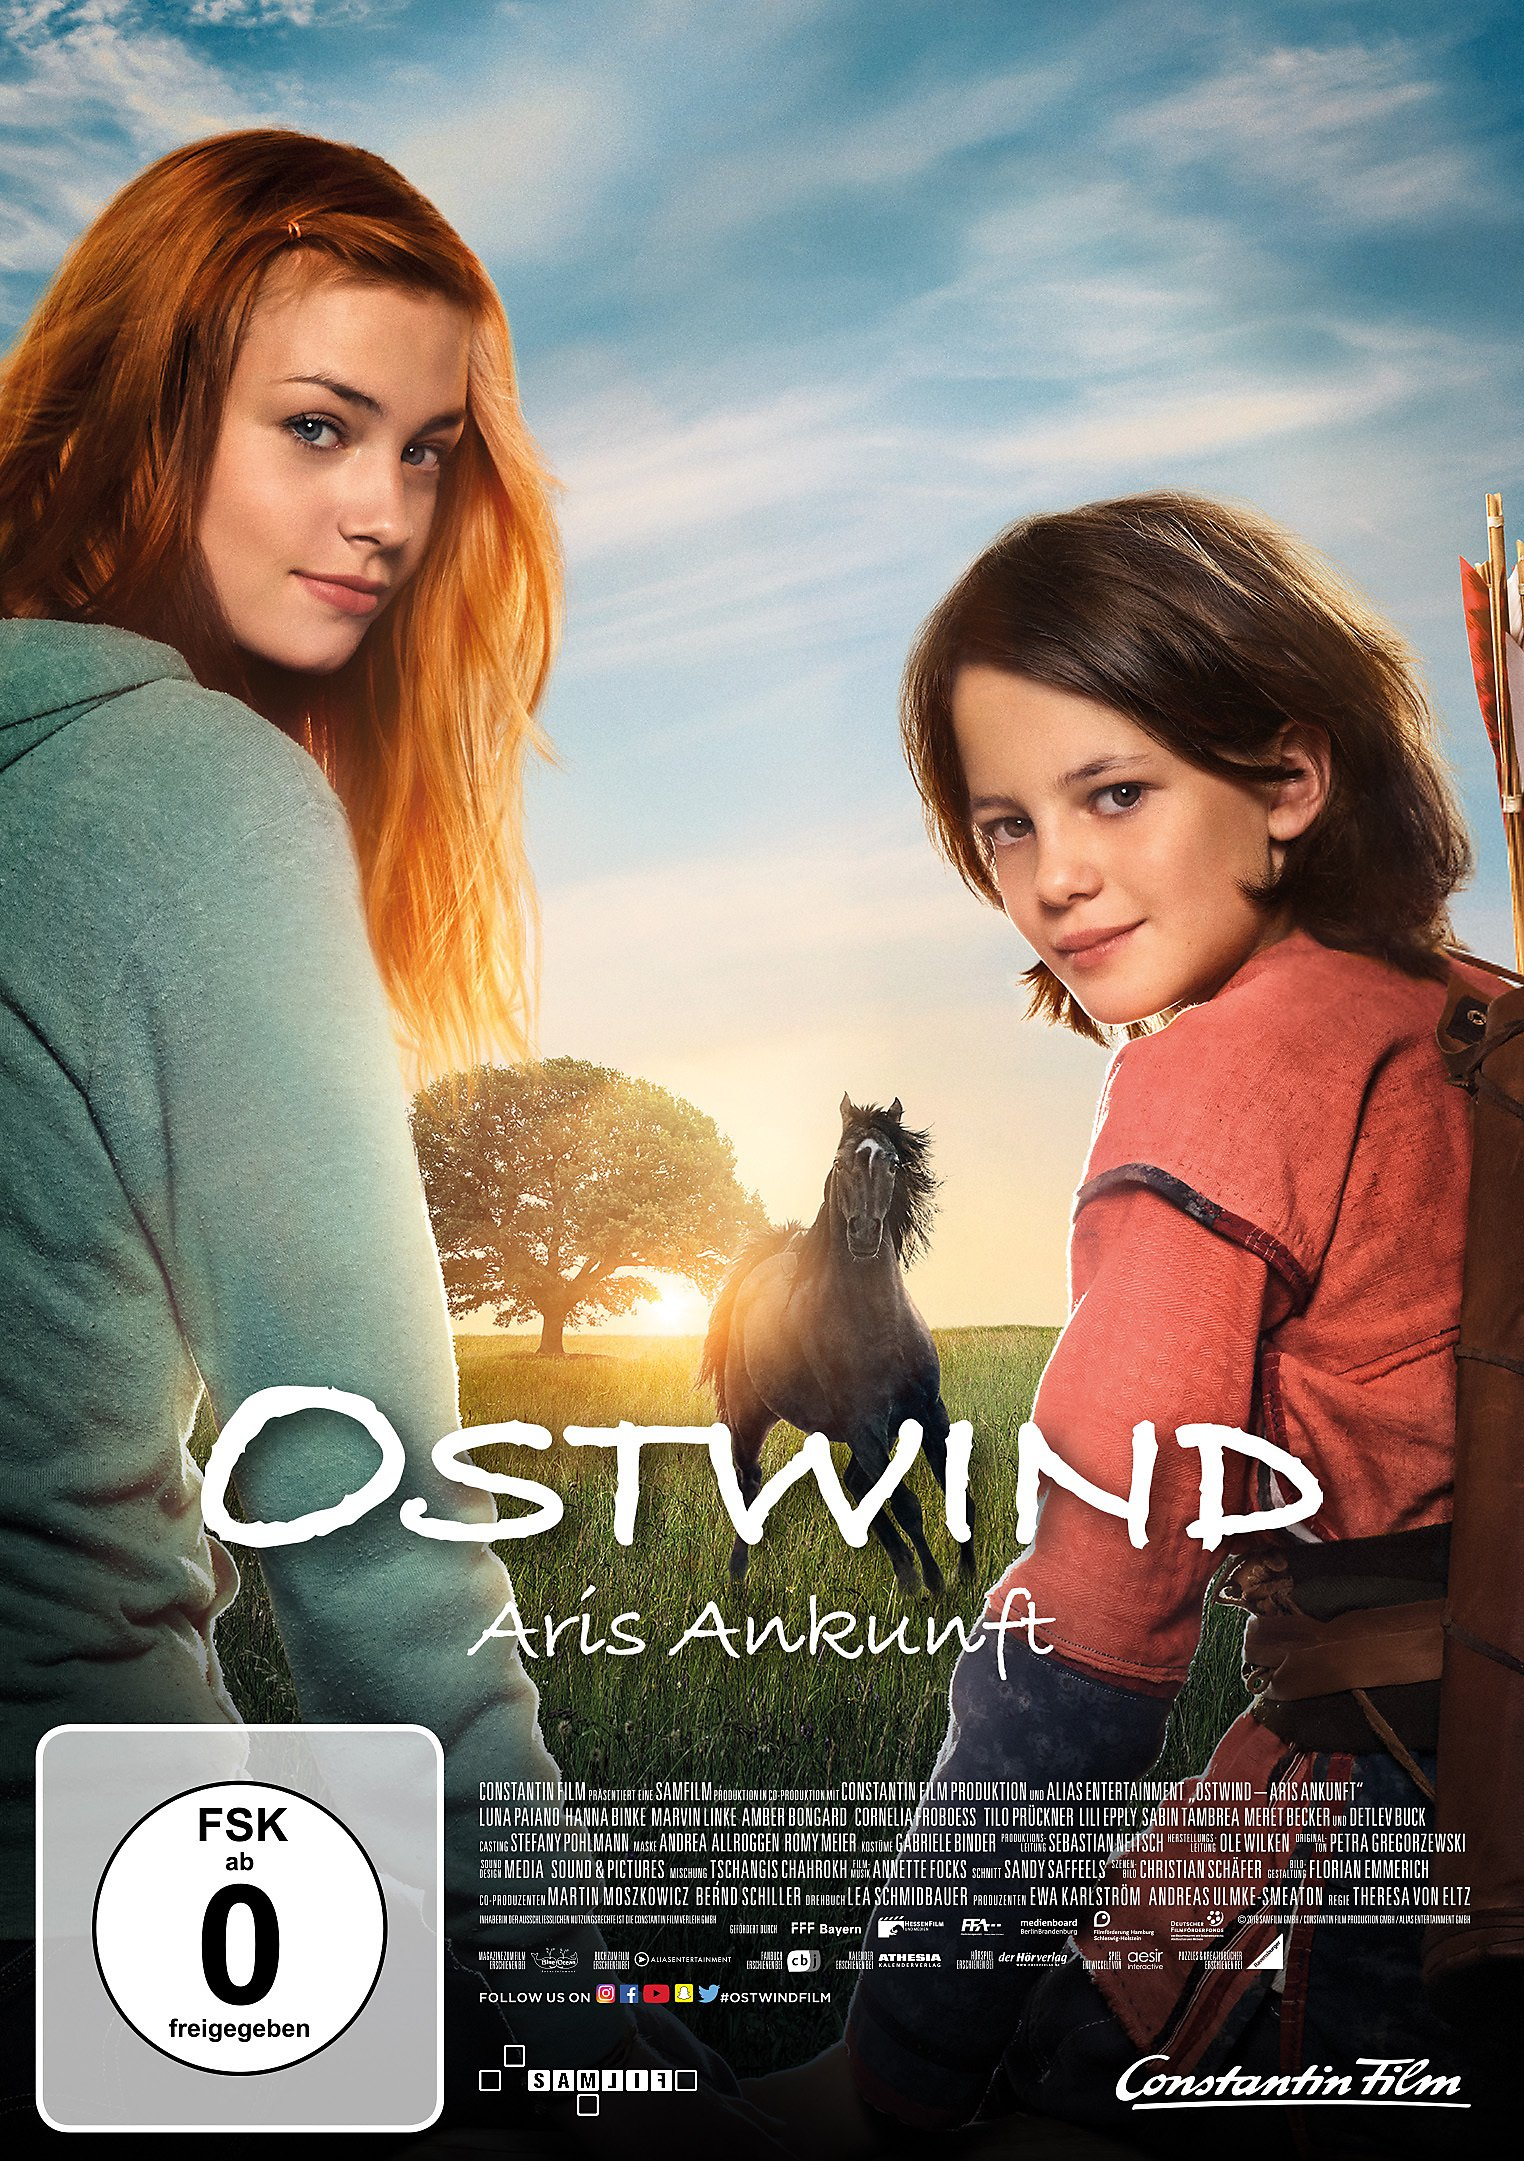 Filme Zu Weihnachten 2019.Ostwind 4 Aris Ankunft Dvd Bei Weltbild De Bestellen